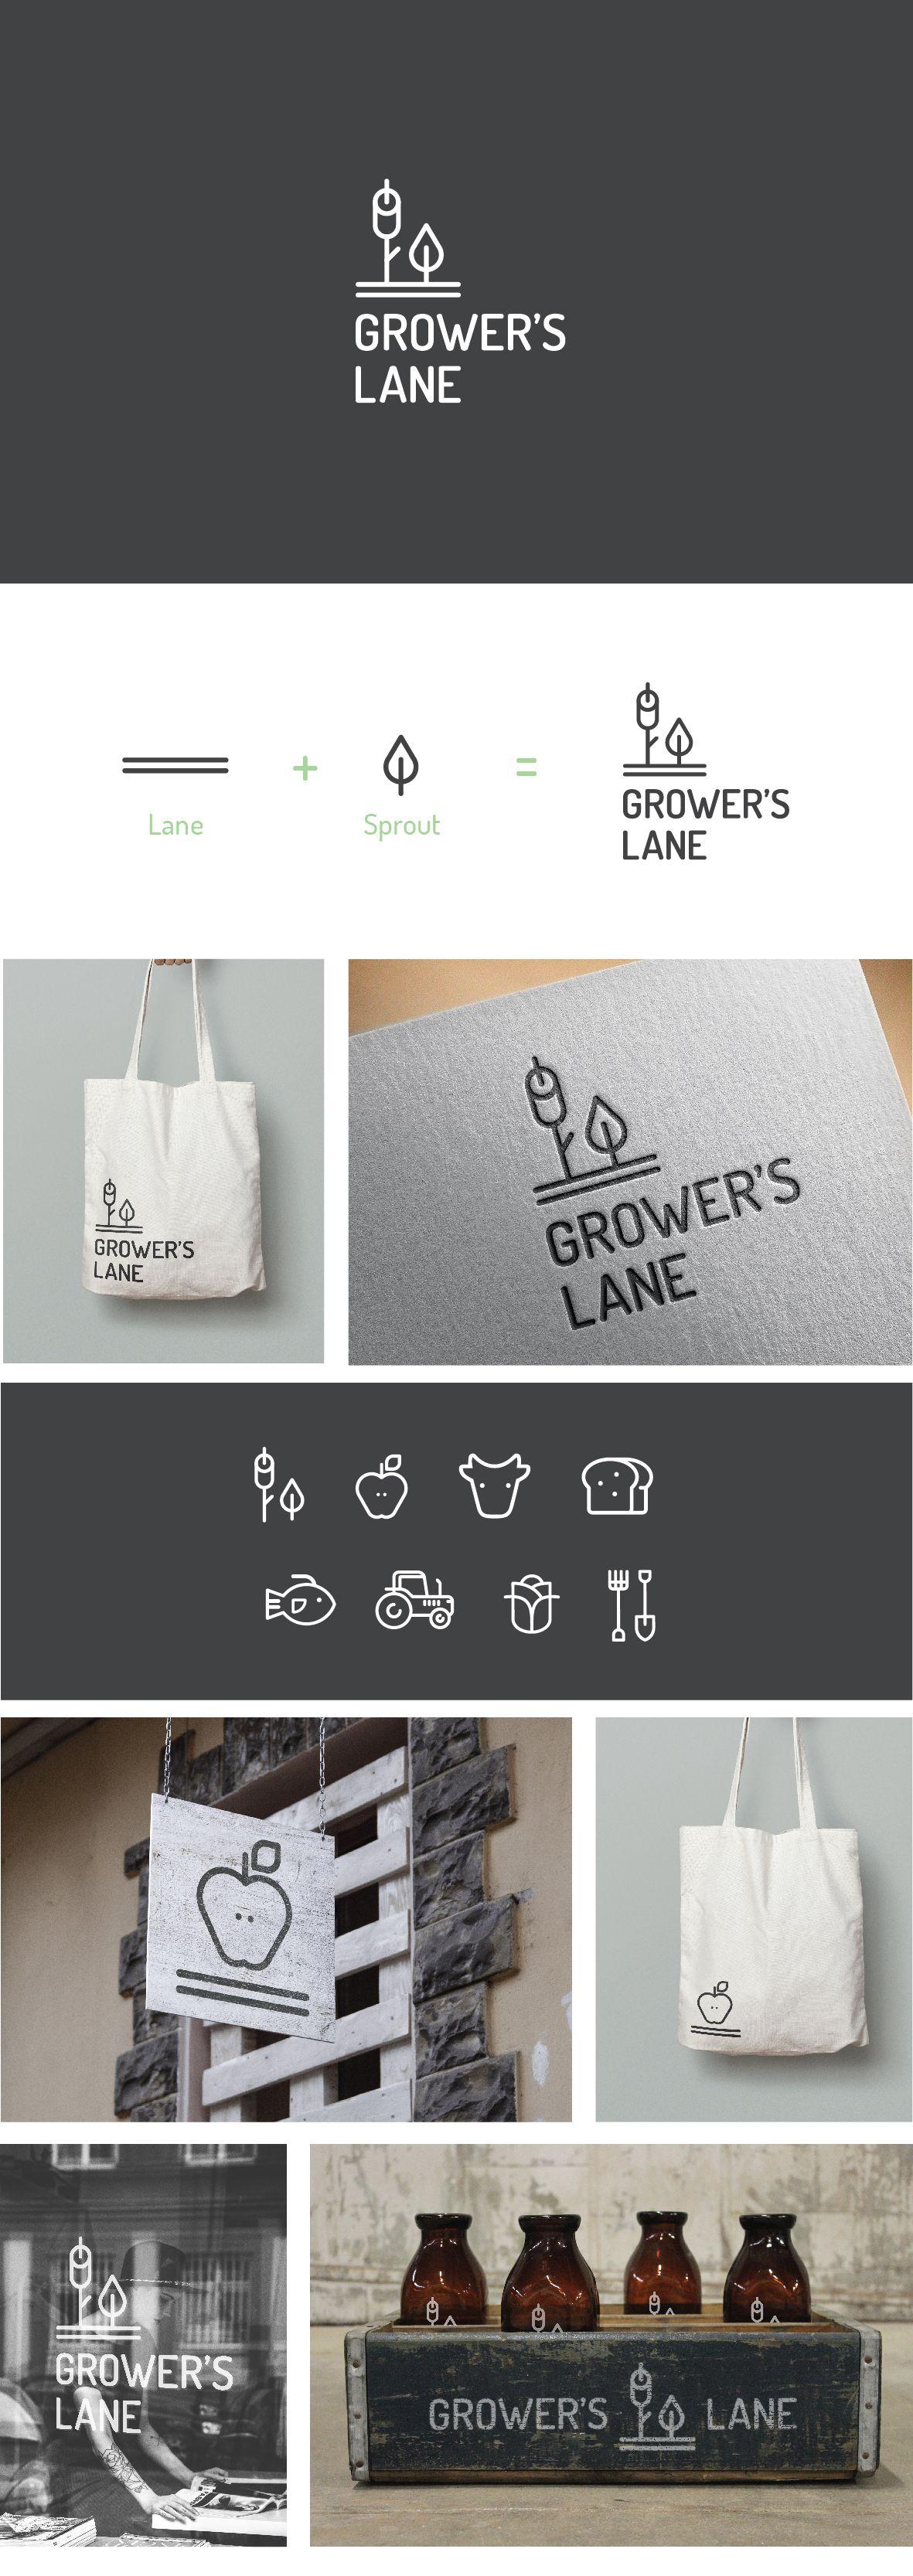 Logo Design, Brand Identity Grocery Store, Market Deli Gourmet Fresh Food Market   Grower's Lane Perth   fruit & veg, store, fresh, organic, farm, local, geometric, shape, line art, modern, minimalist, mark, monogram, inspiration.